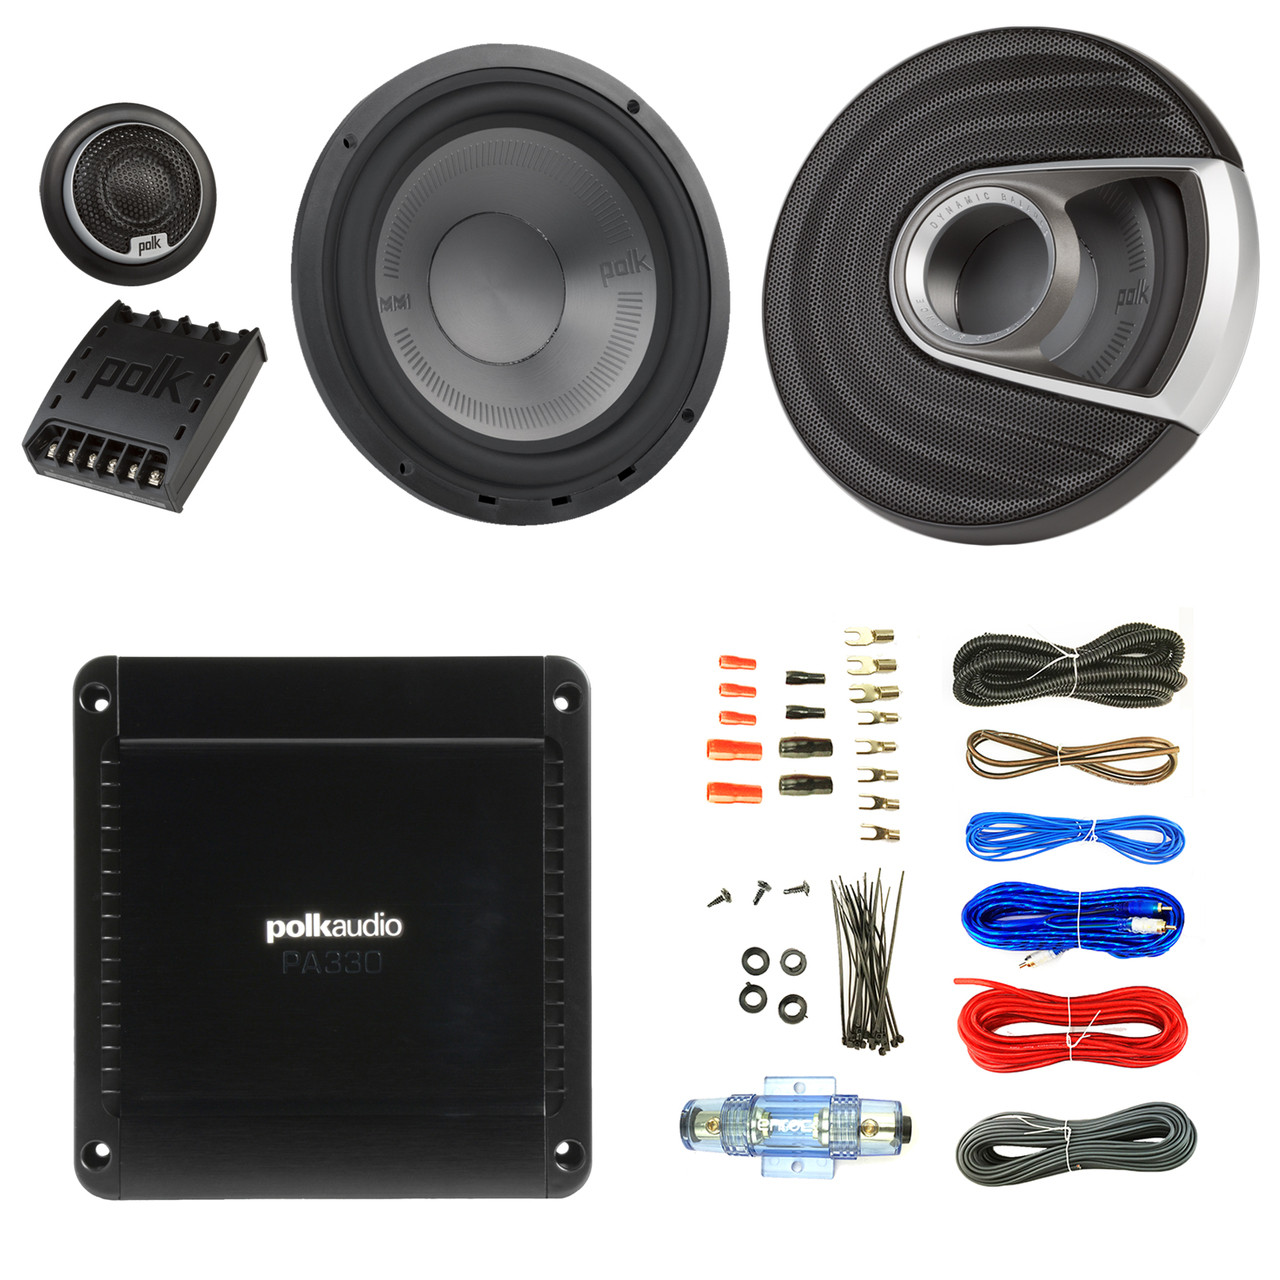 medium resolution of 2x polk audio mm1 mm6502 series 375w ultra marine certified 6 5 component speaker system pa330 330w 2 channel car amplifier enrock audio 16 gauge 50 foot